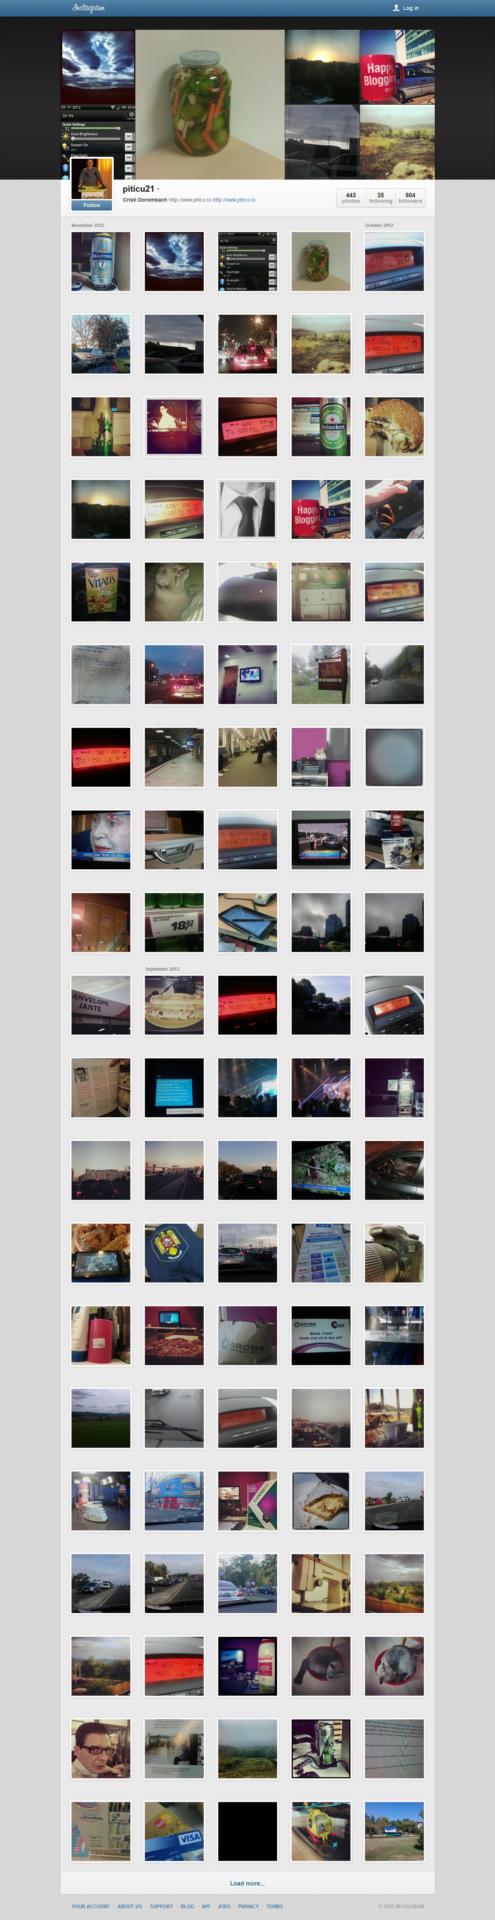 instagram.com screen capture 2012-11-7-20-43-9